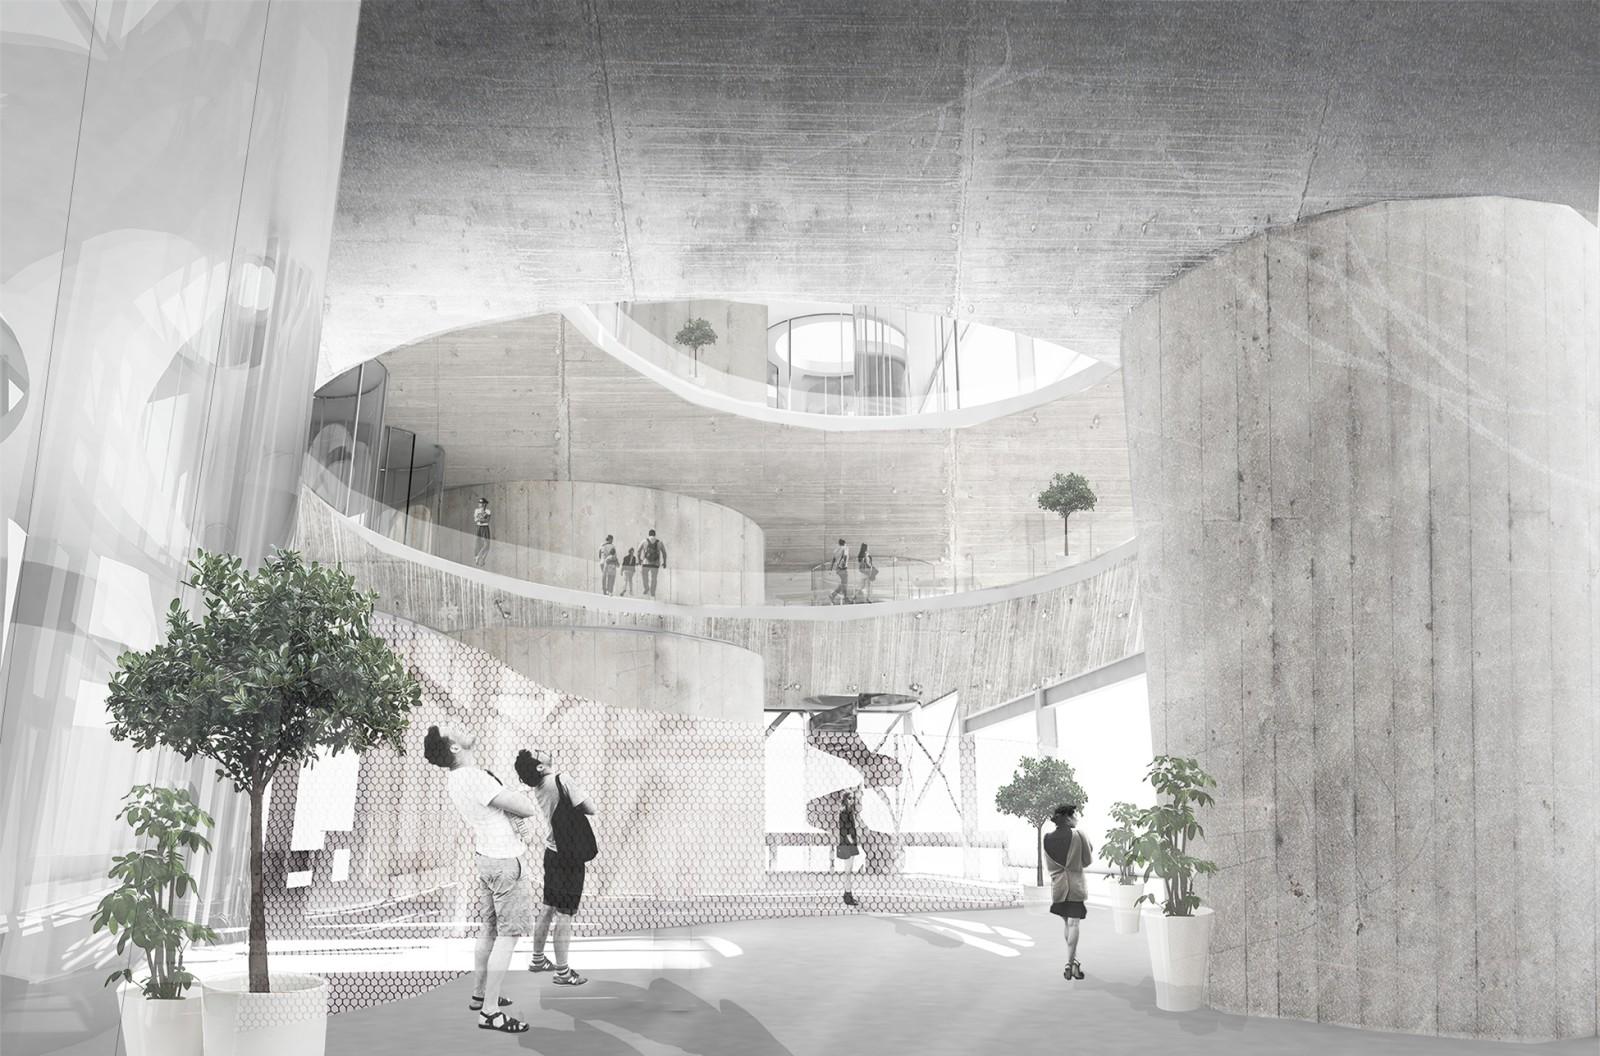 asai architecture in perspective awards bridge. Black Bedroom Furniture Sets. Home Design Ideas